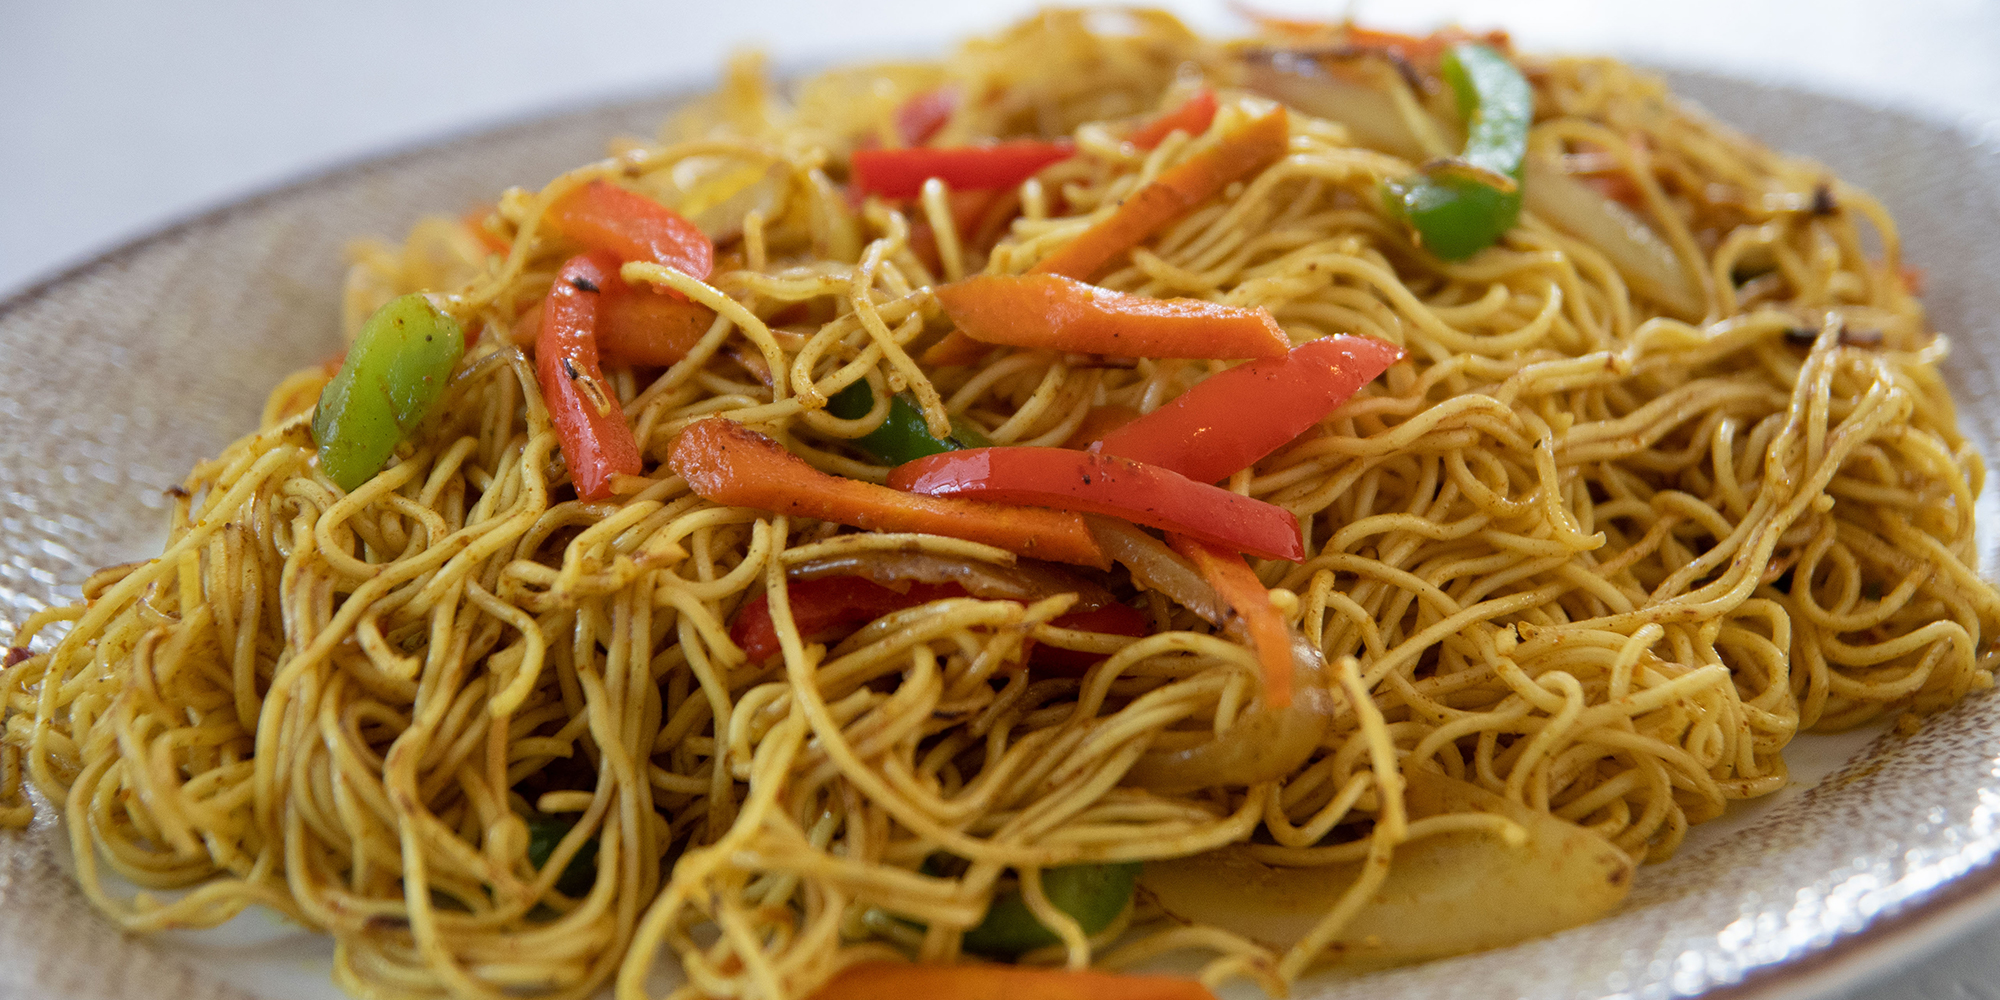 Spicy-Noodles